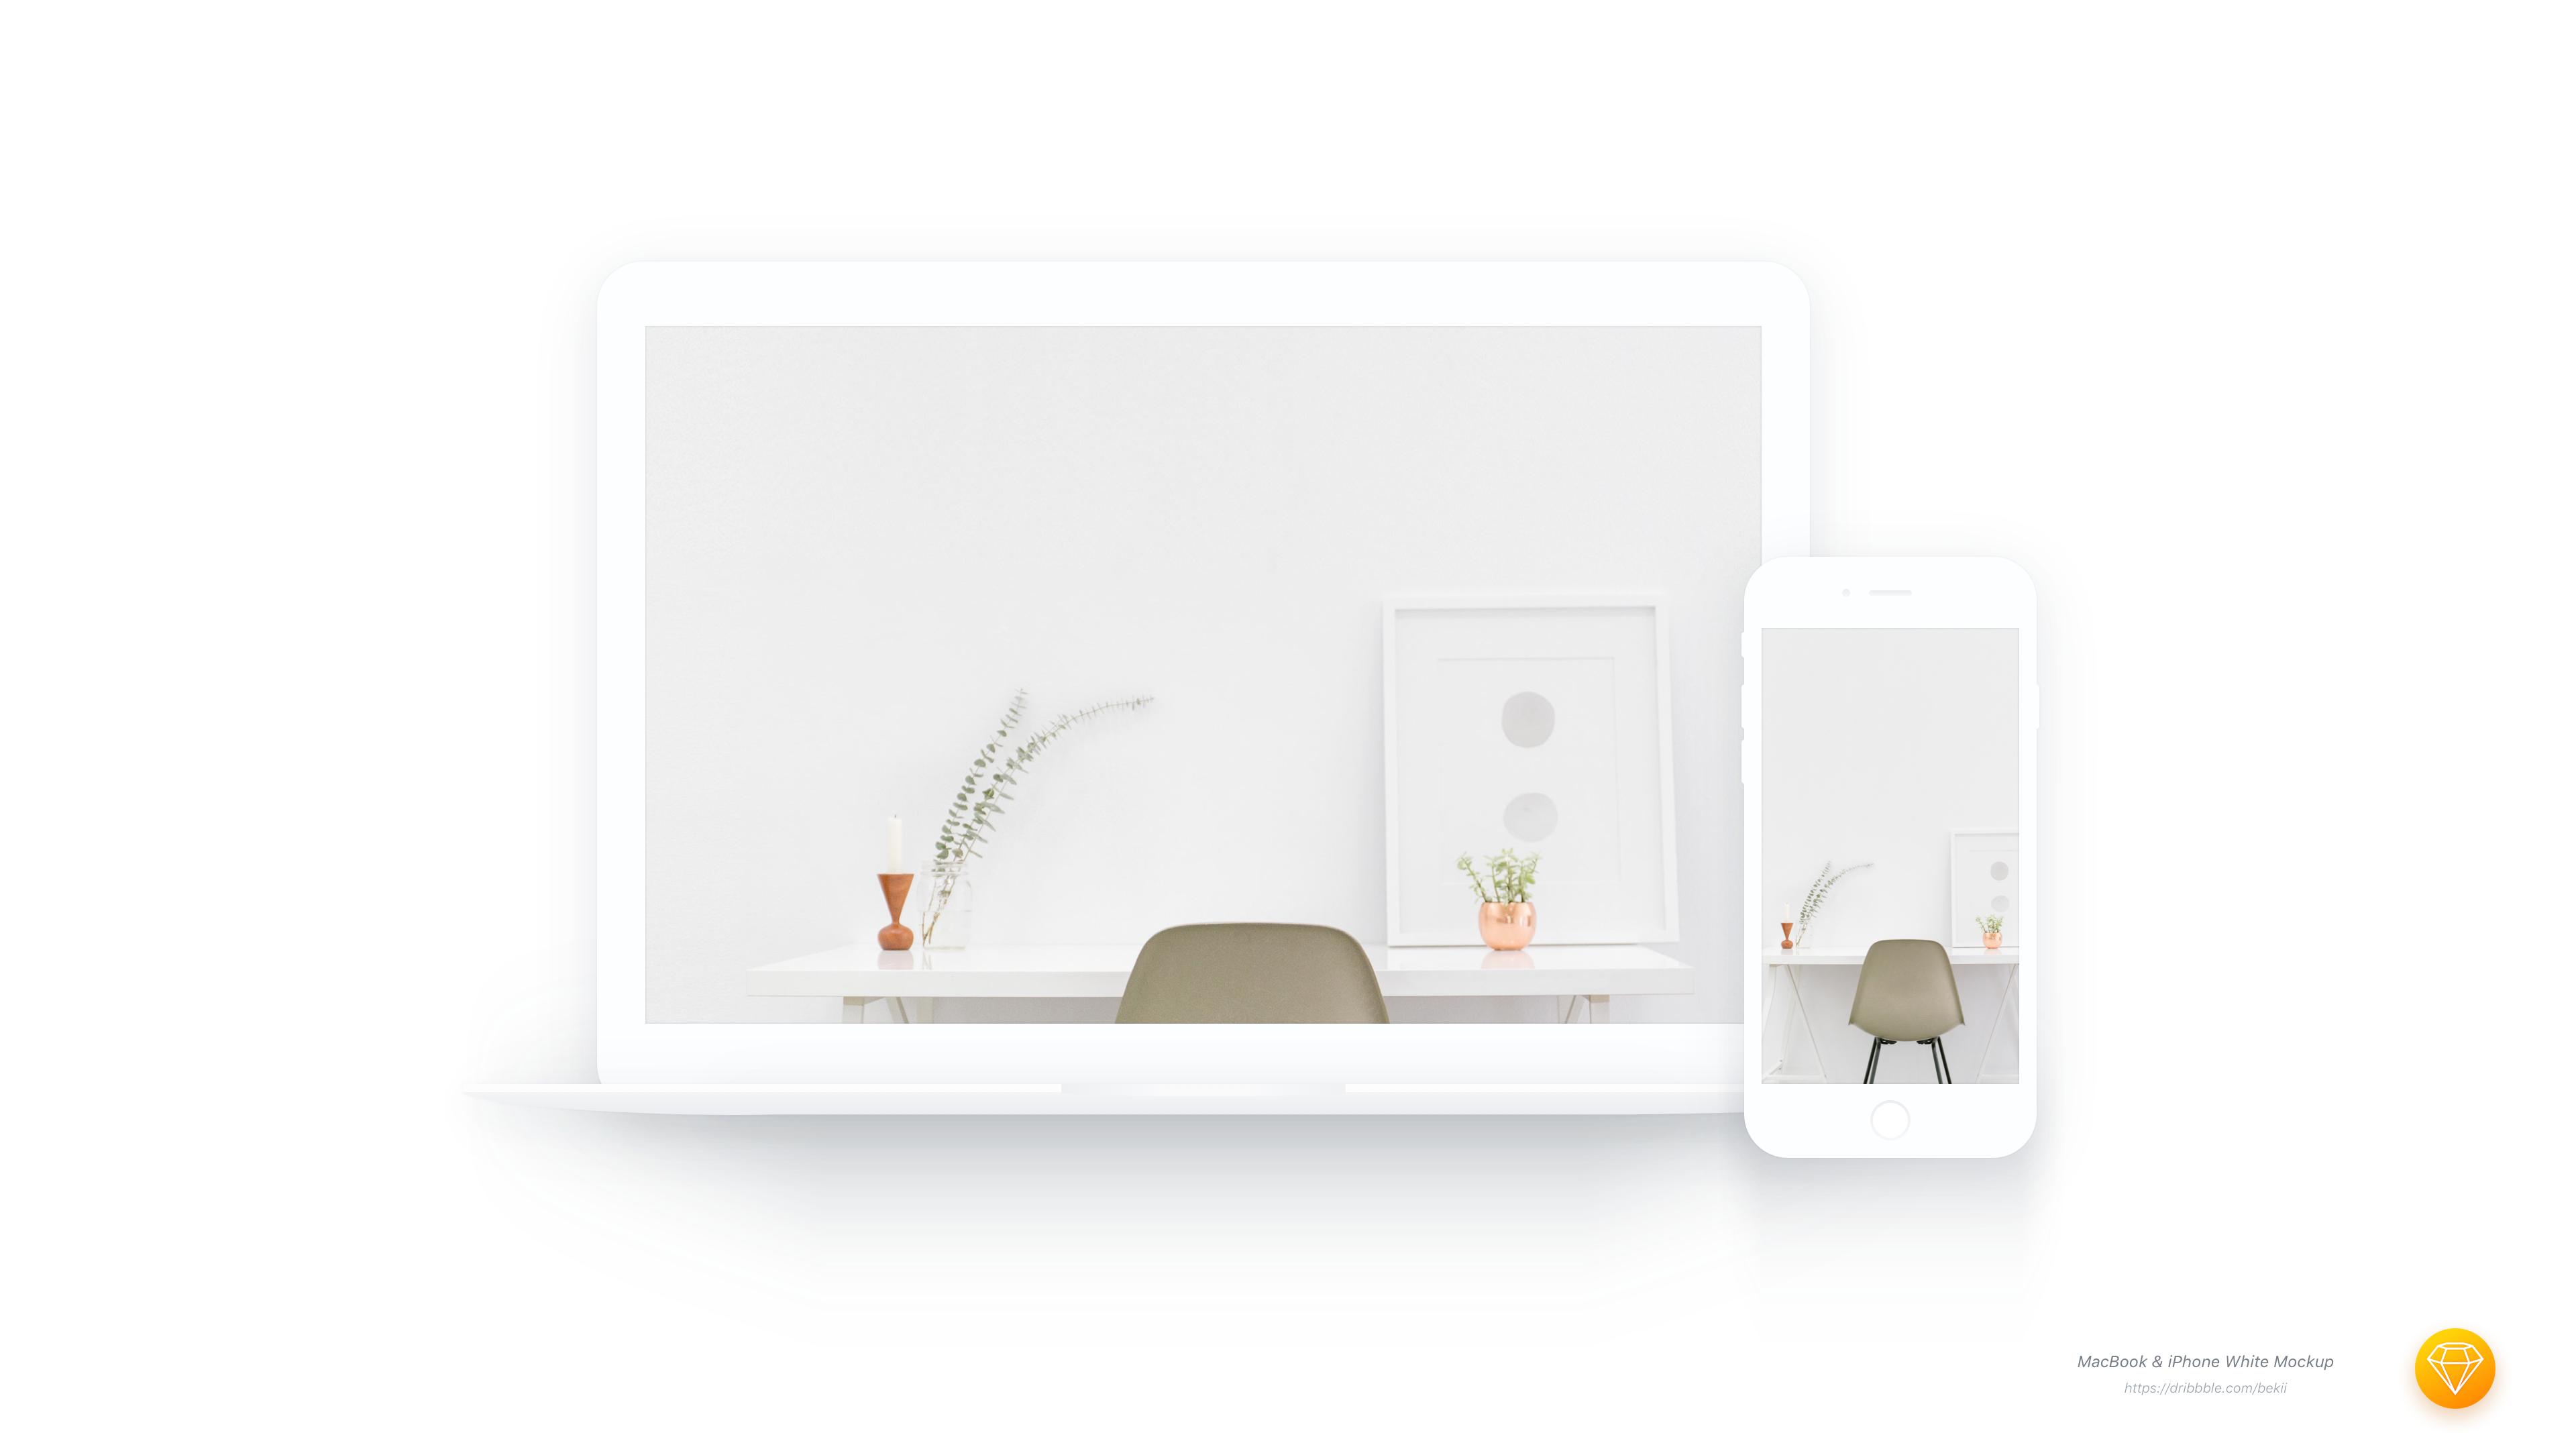 Macbook iphone white mockup real pixel